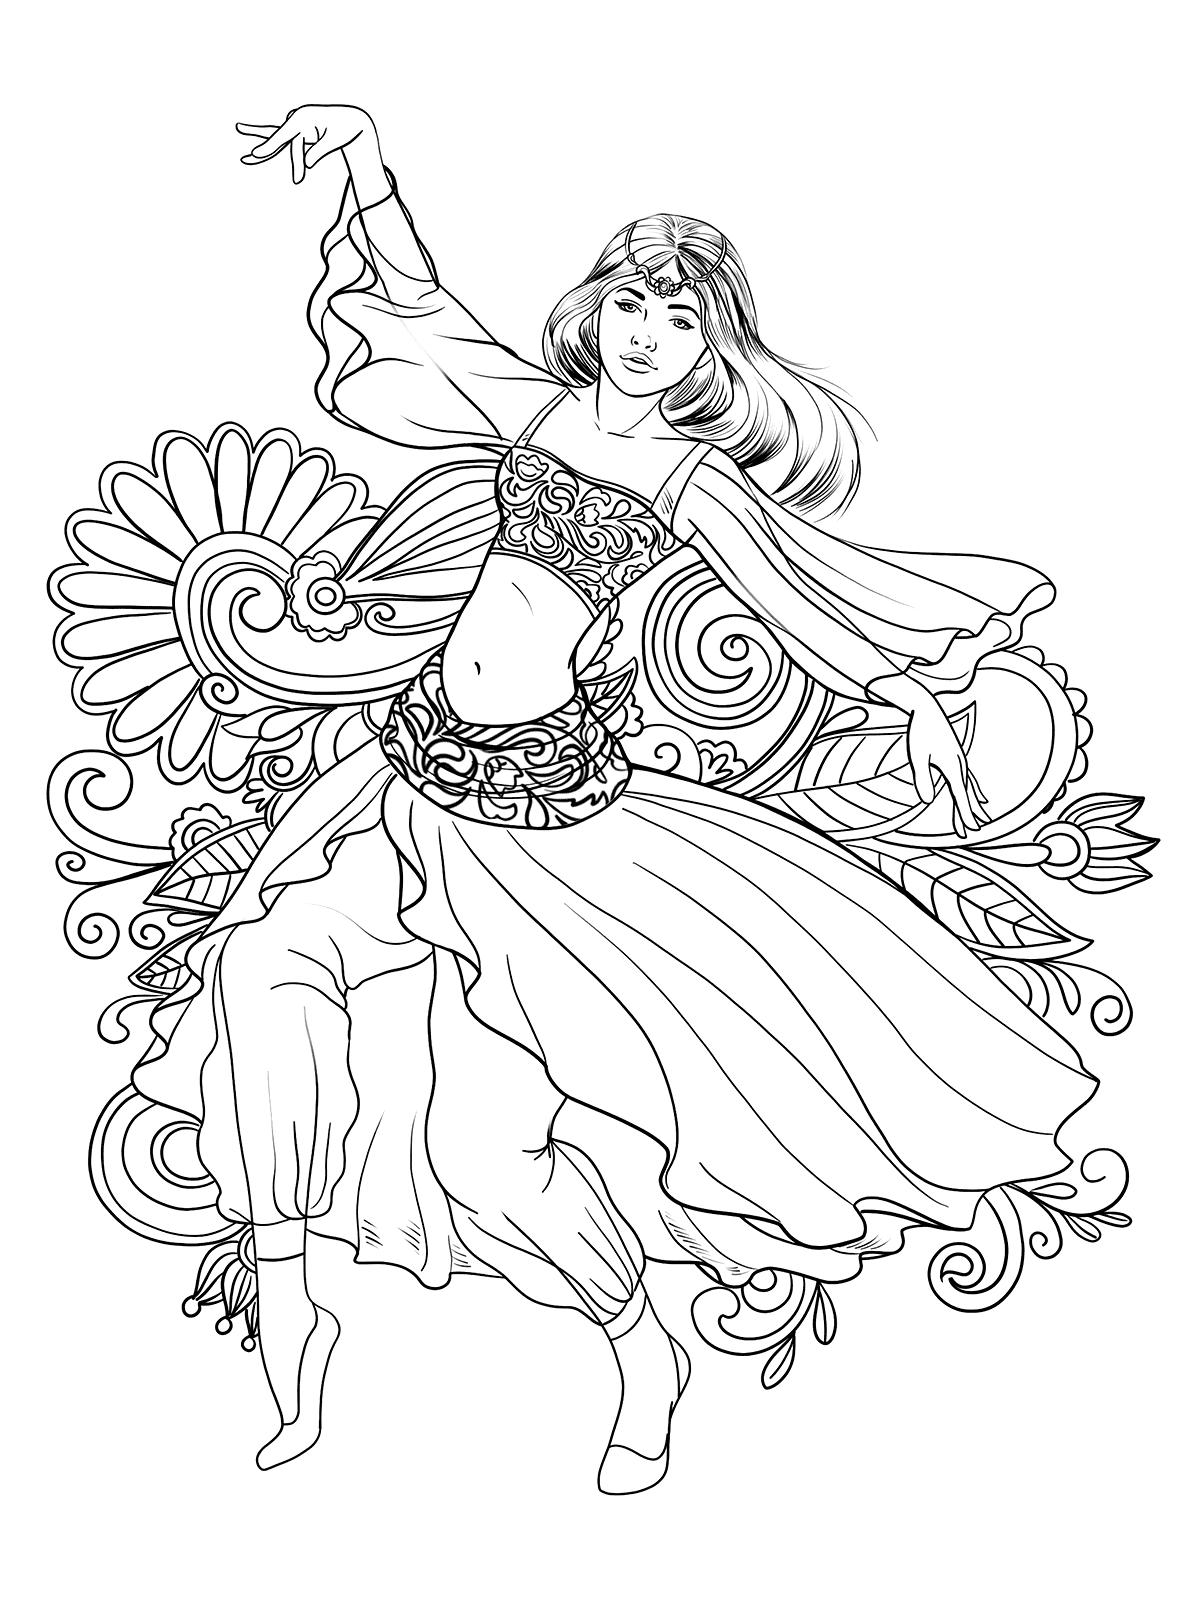 Раскраска Танцовщица. Раскраска антистресс